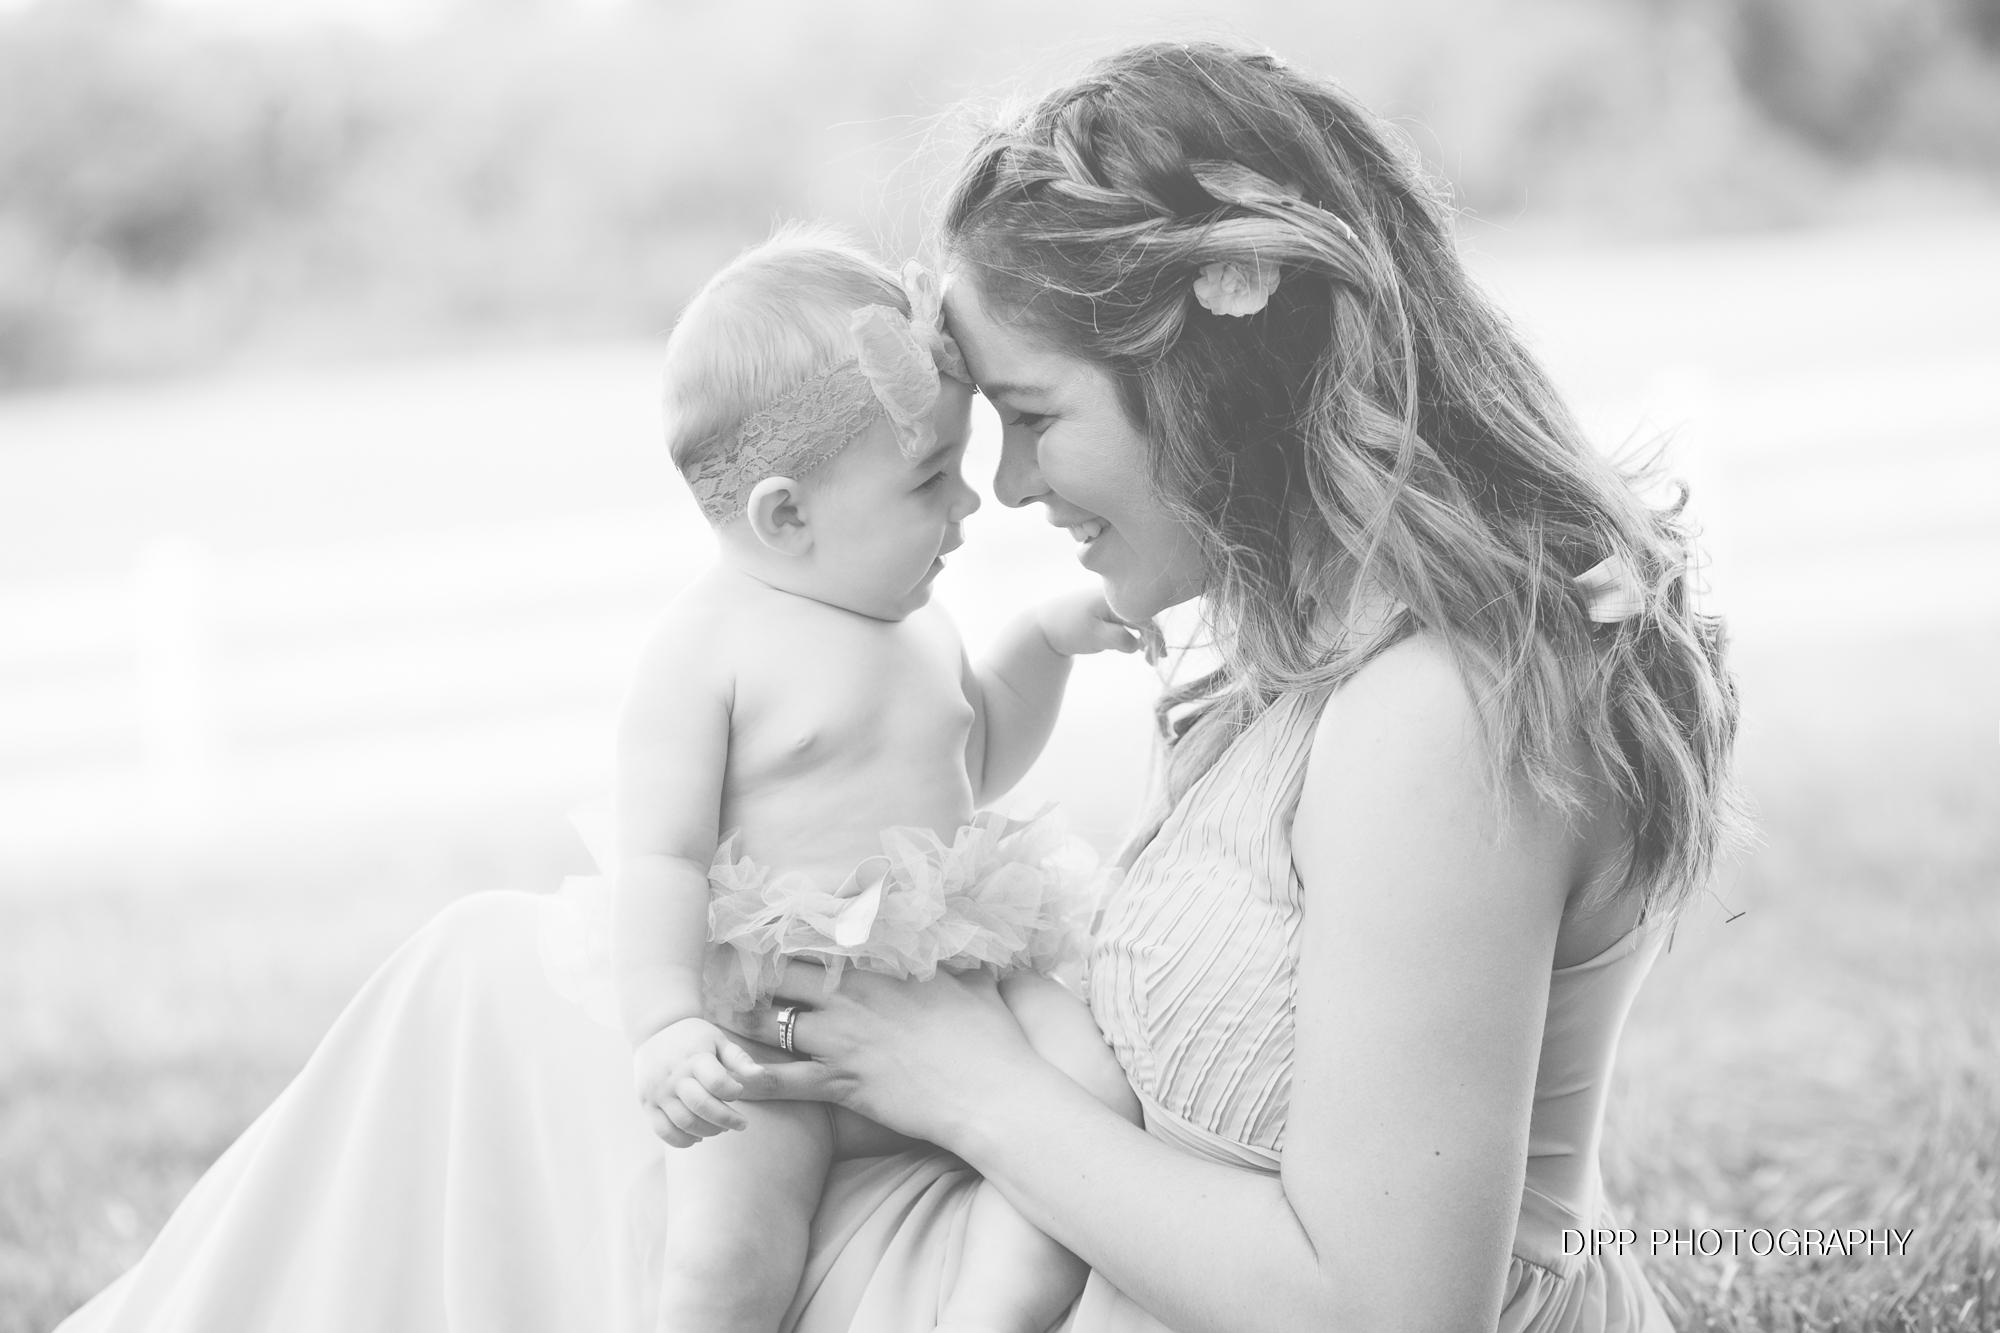 Dipp_2016 Gabrielle's 6 Months-359-Edit